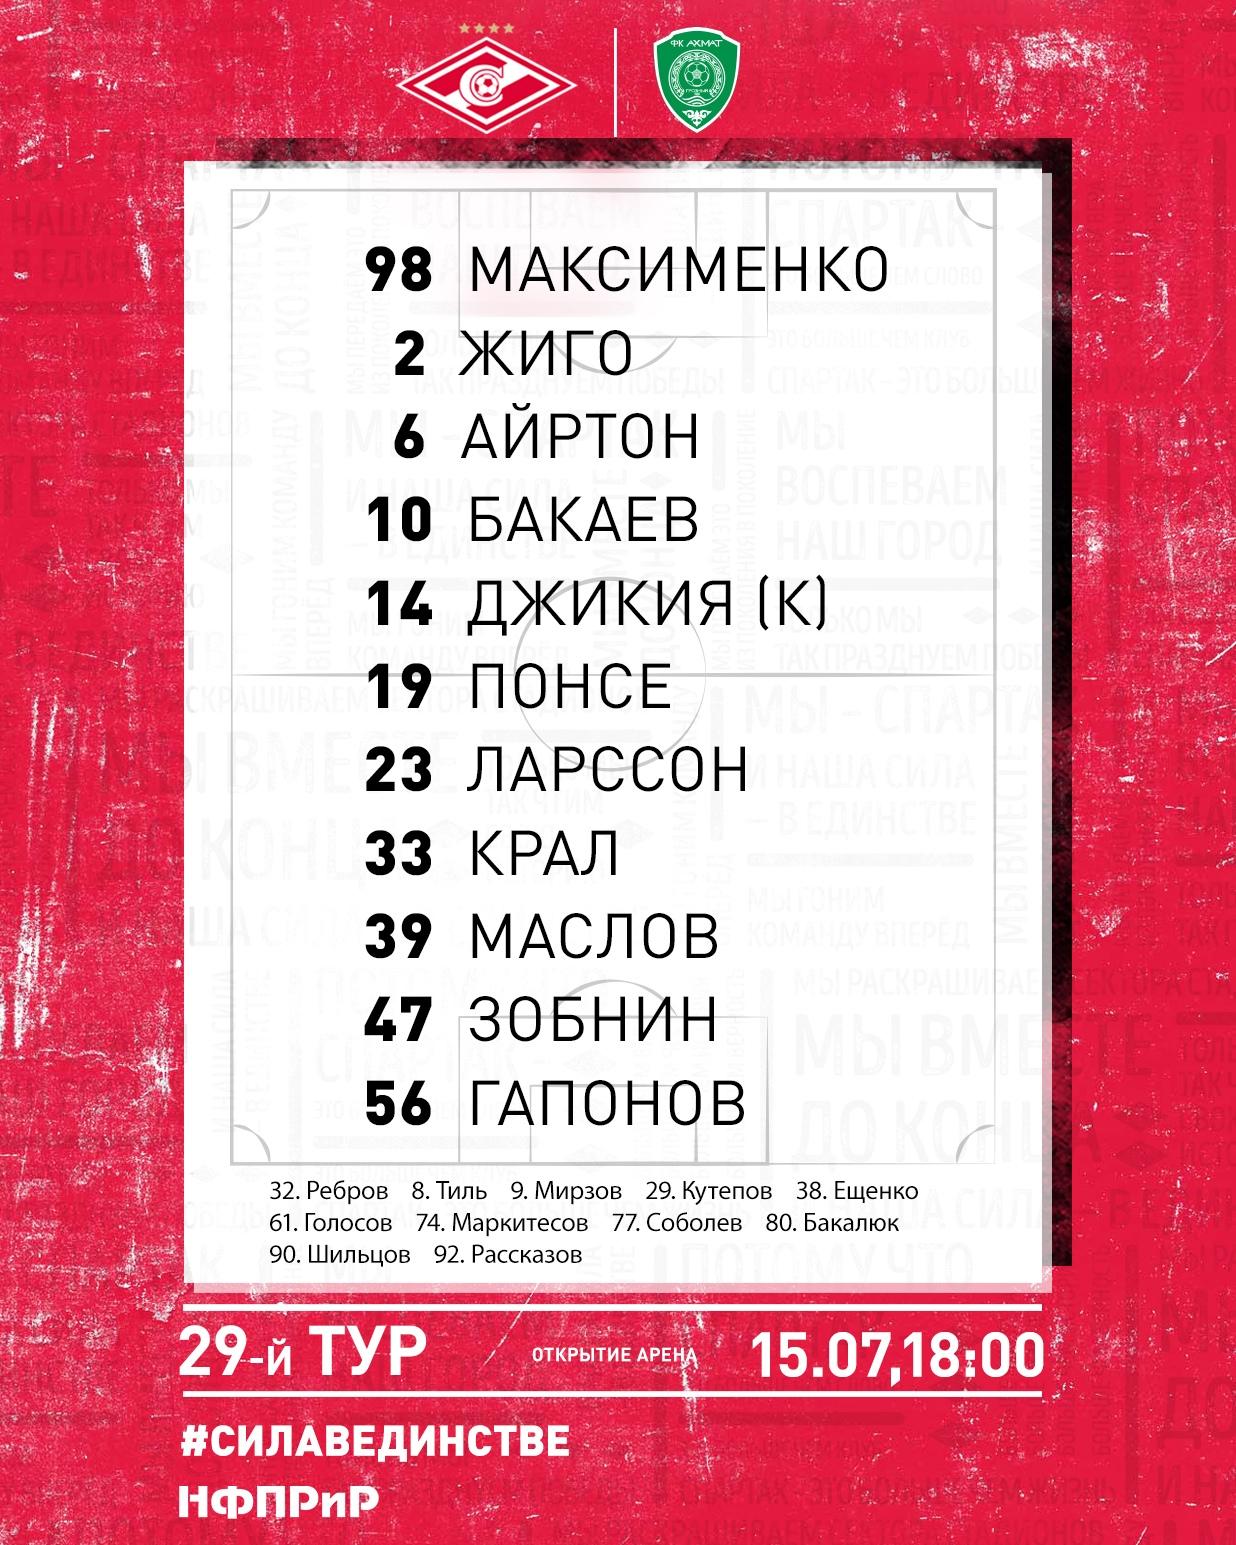 Состав «Спартака» на матч 29-го тура с «Ахматом»